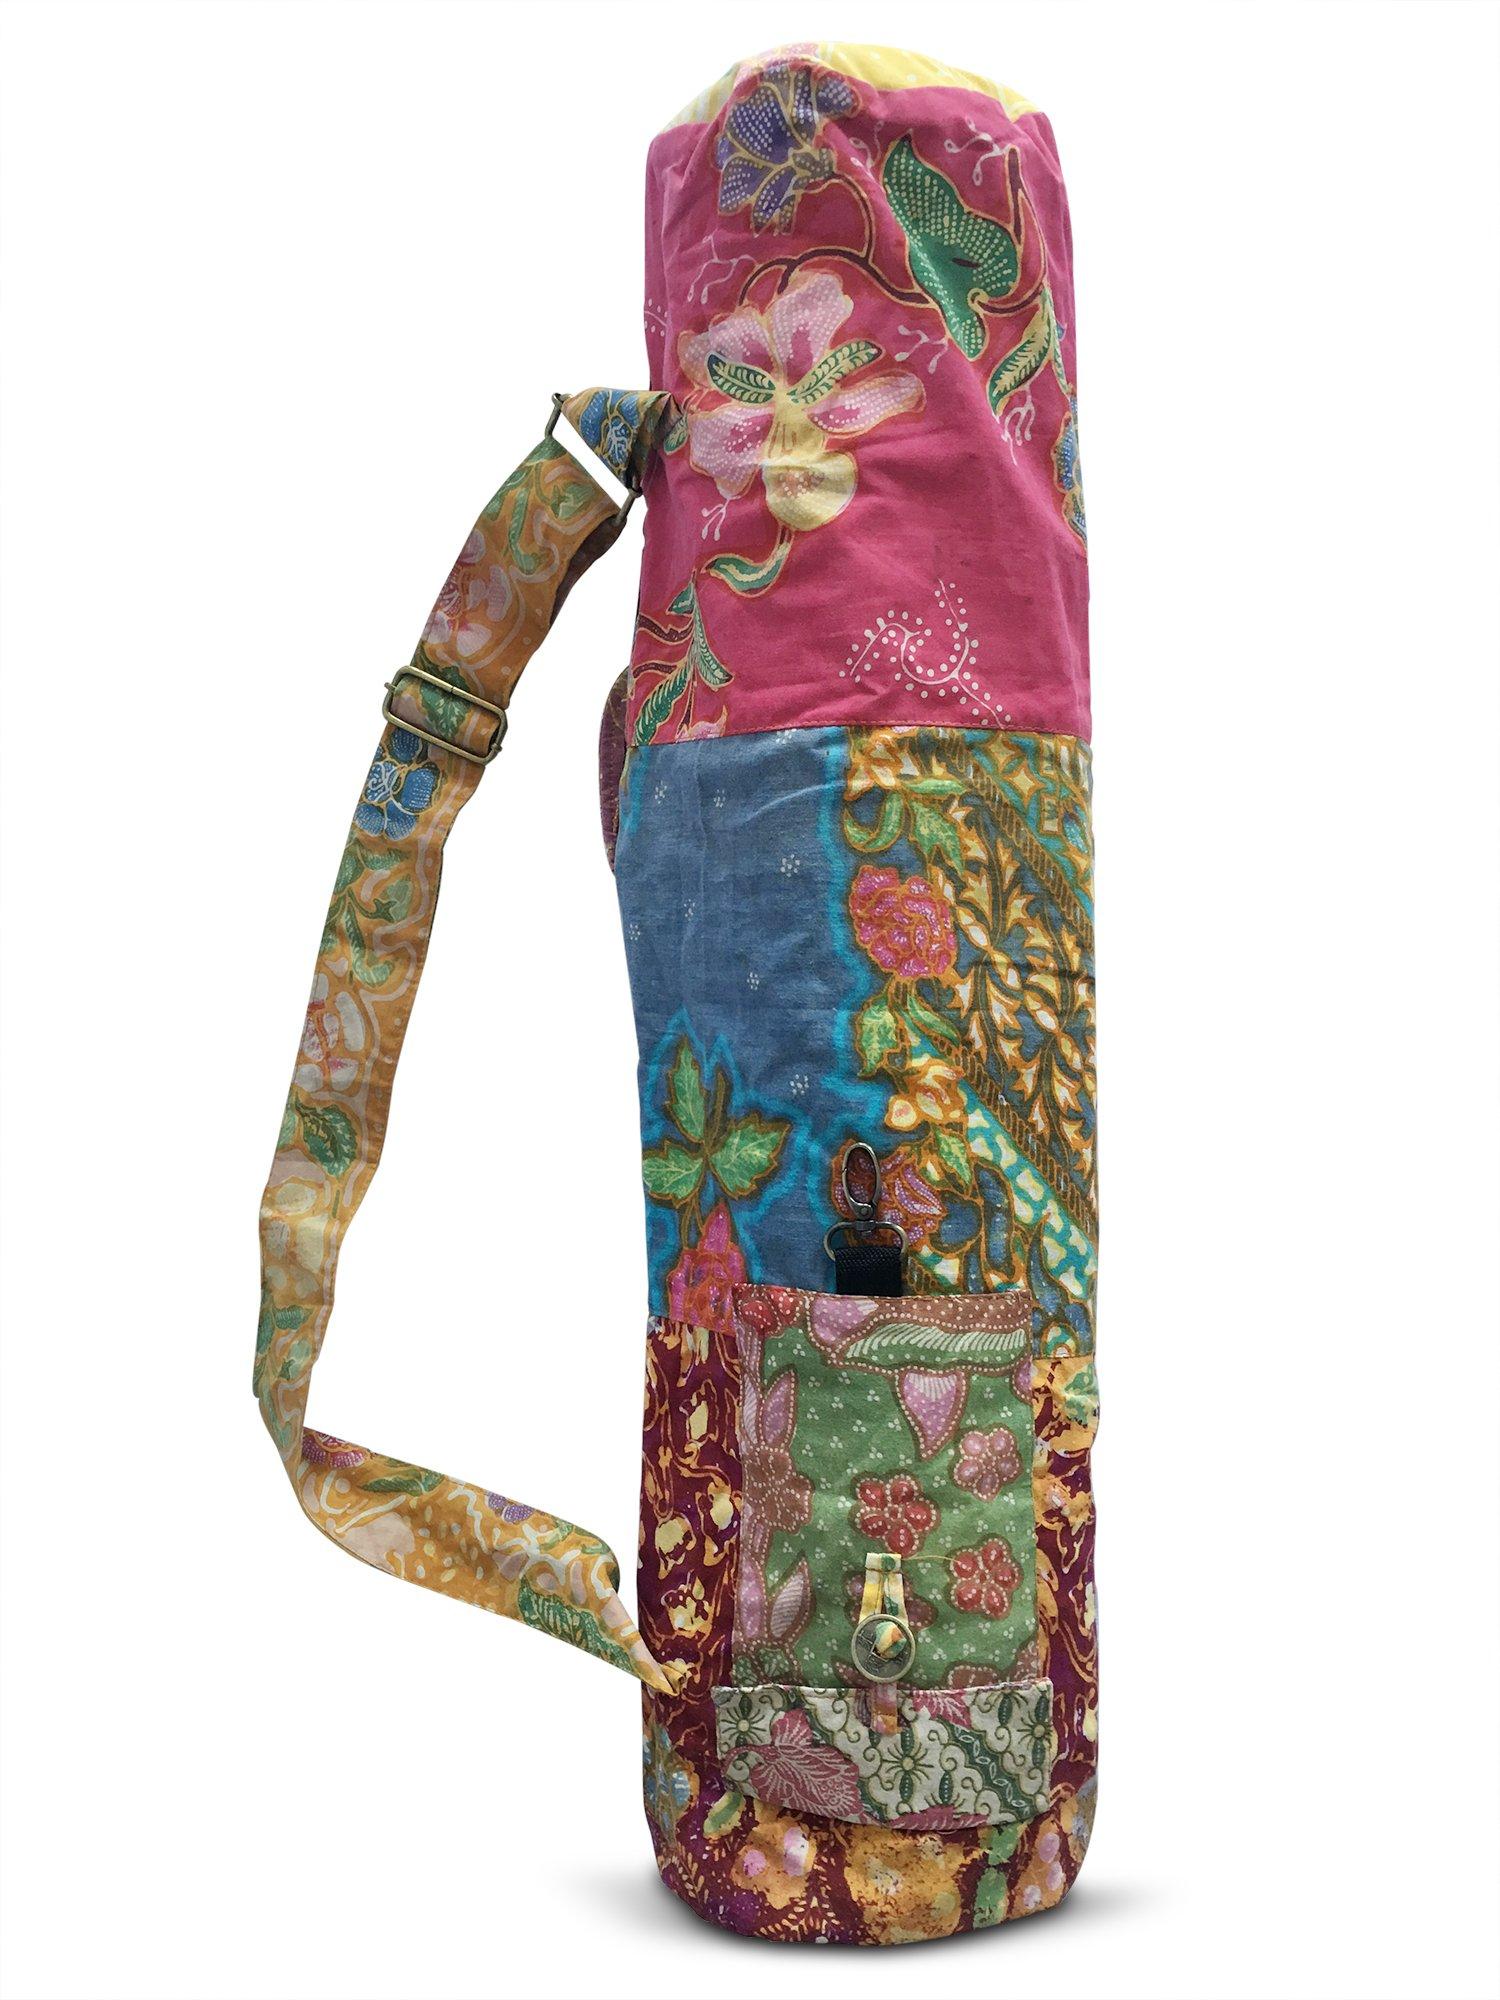 Yoga Mat Bag Large Full Zip Exercise Yoga Mat Sling Bag Recycled Vintage Batik Cotton Handmade Fully Lined with Adjustable Strap, 2 Storage Pockets and Keychain Hook (1 Bag Only)